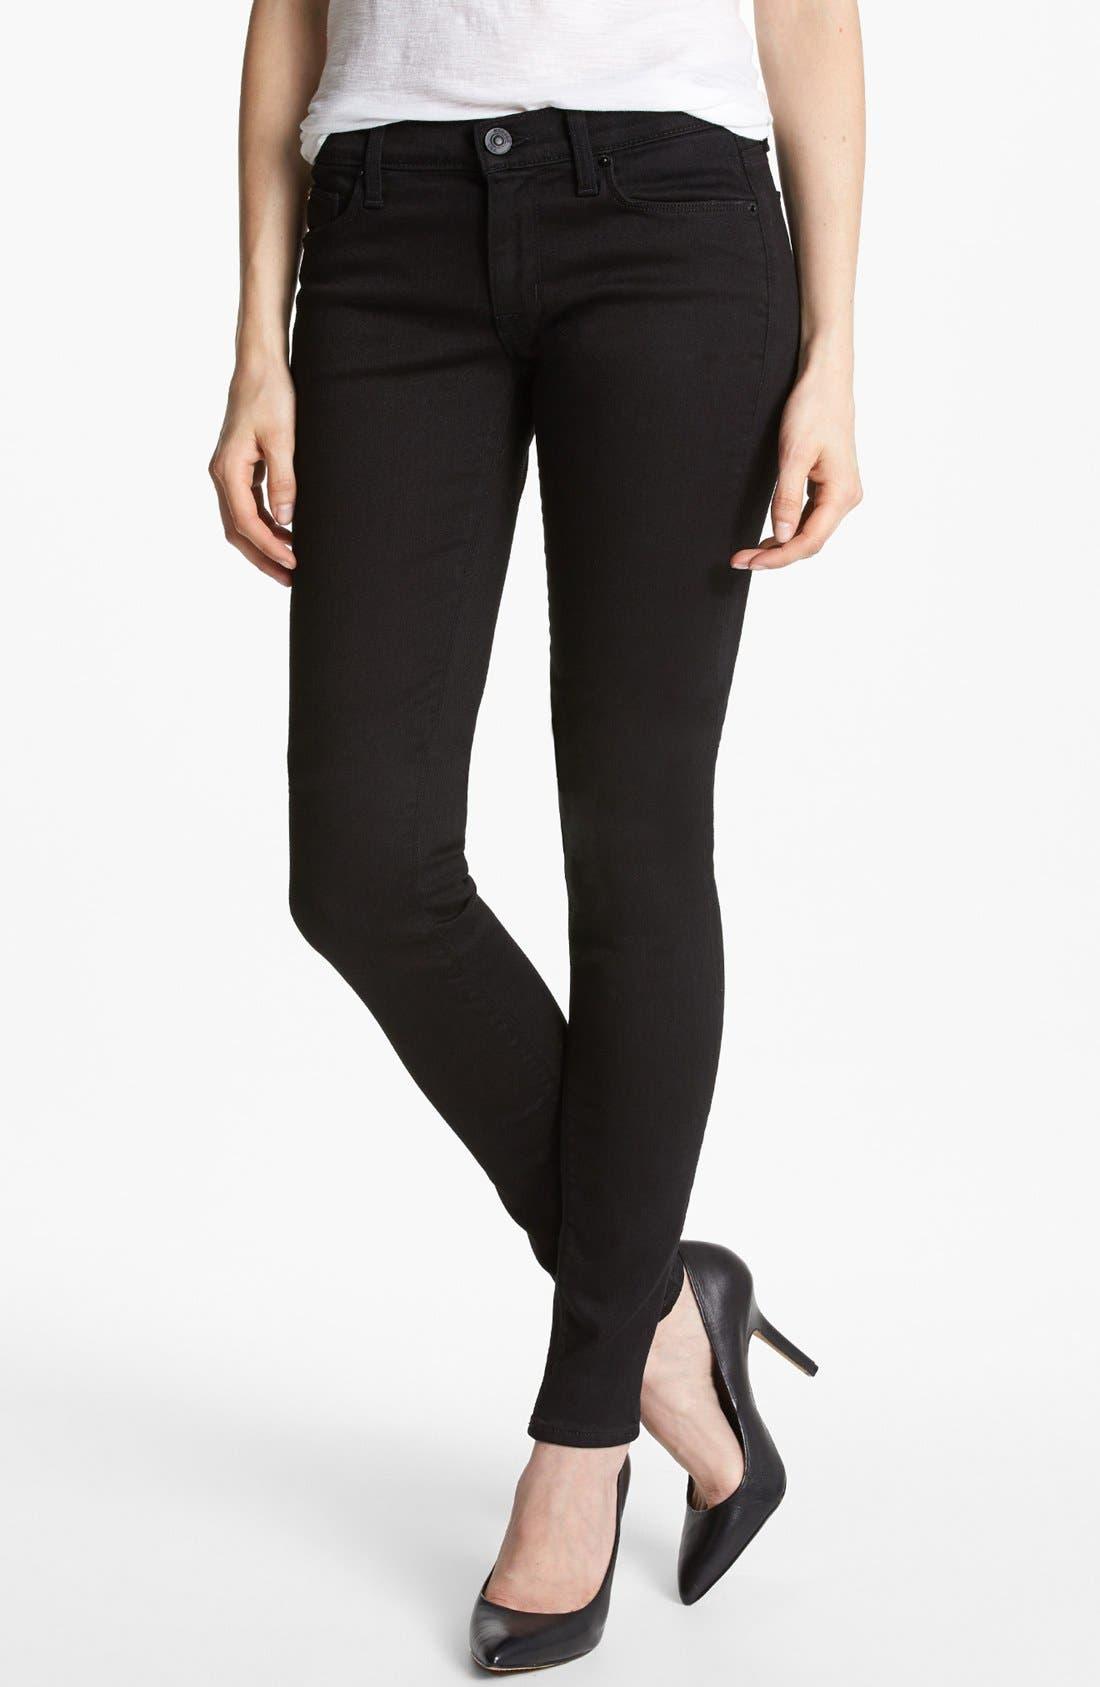 Main Image - Hudson Jeans 'Krista Supermodel' Skinny Jeans (Black)